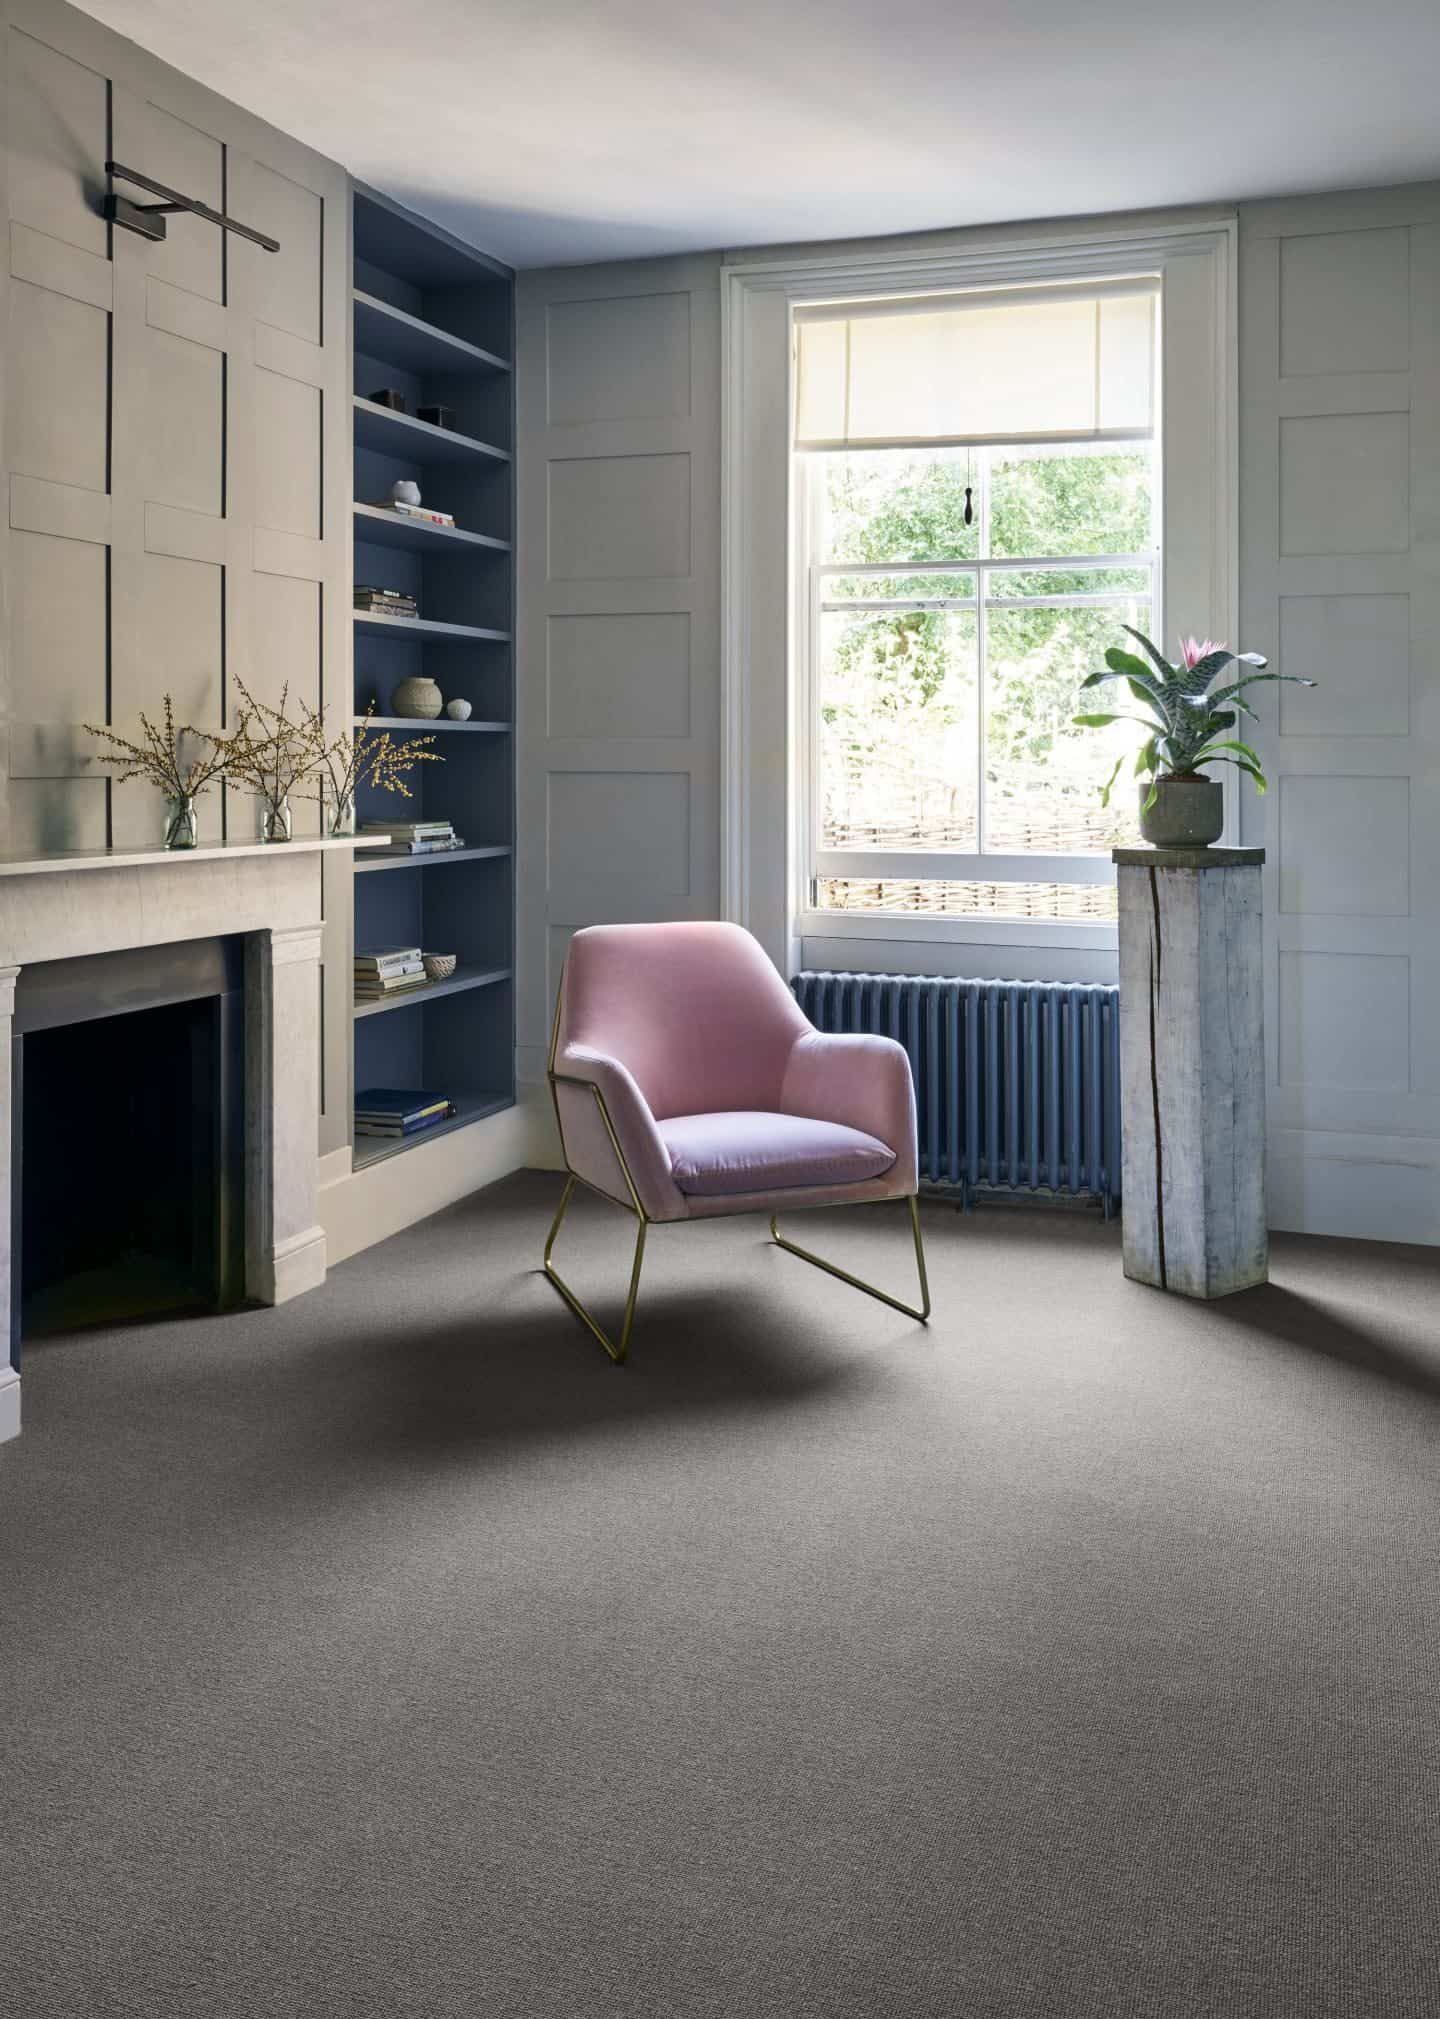 Kersaint Cobb - Pampras Nordic, Skagen - Natural Flooring